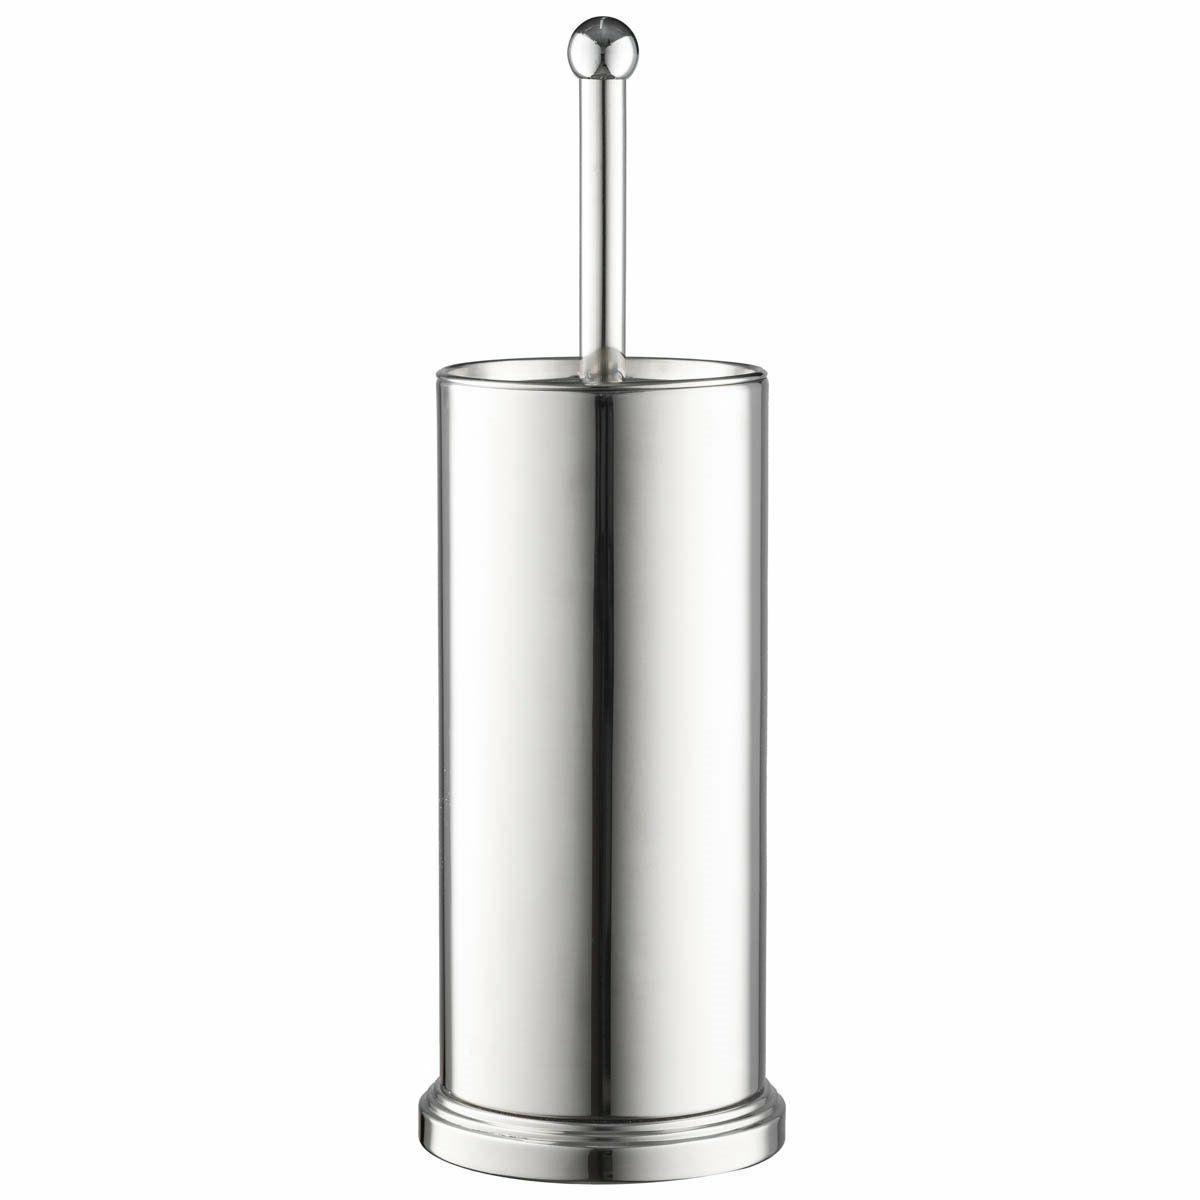 Chrome Brush Vented Stainless Steel Bowl cleaner Lid